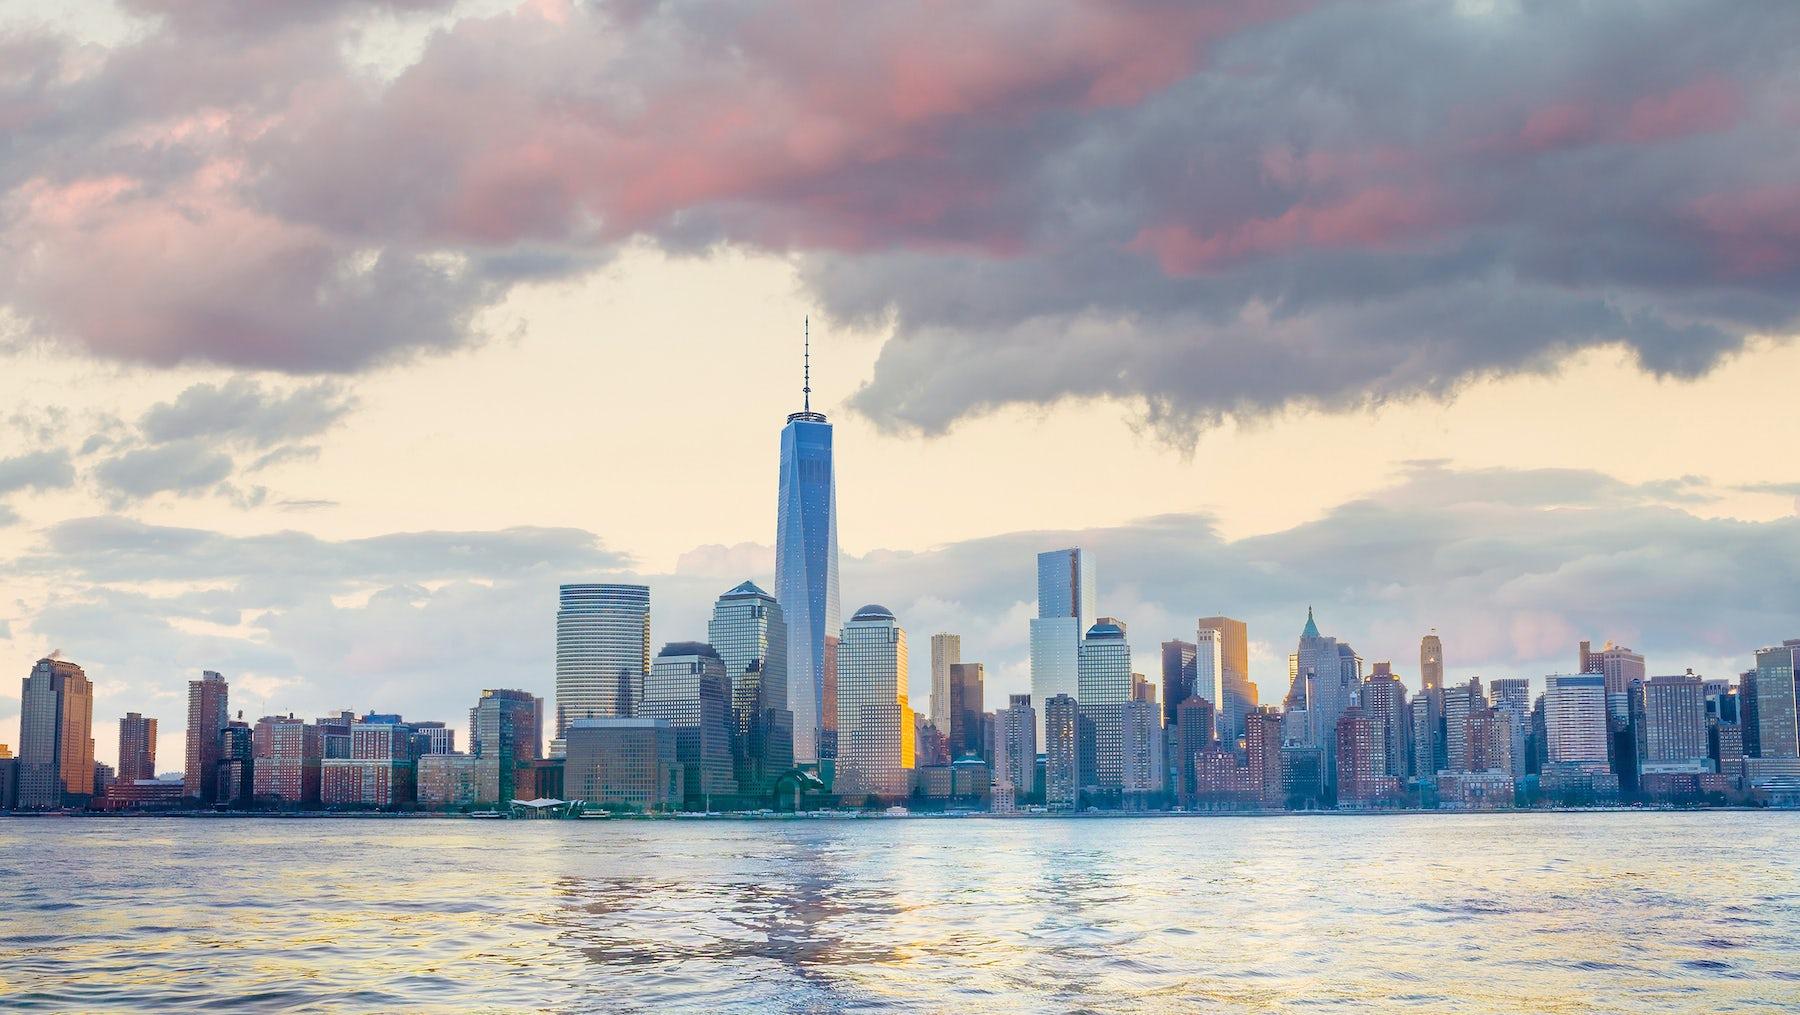 Manhattan | Source: Shutterstock